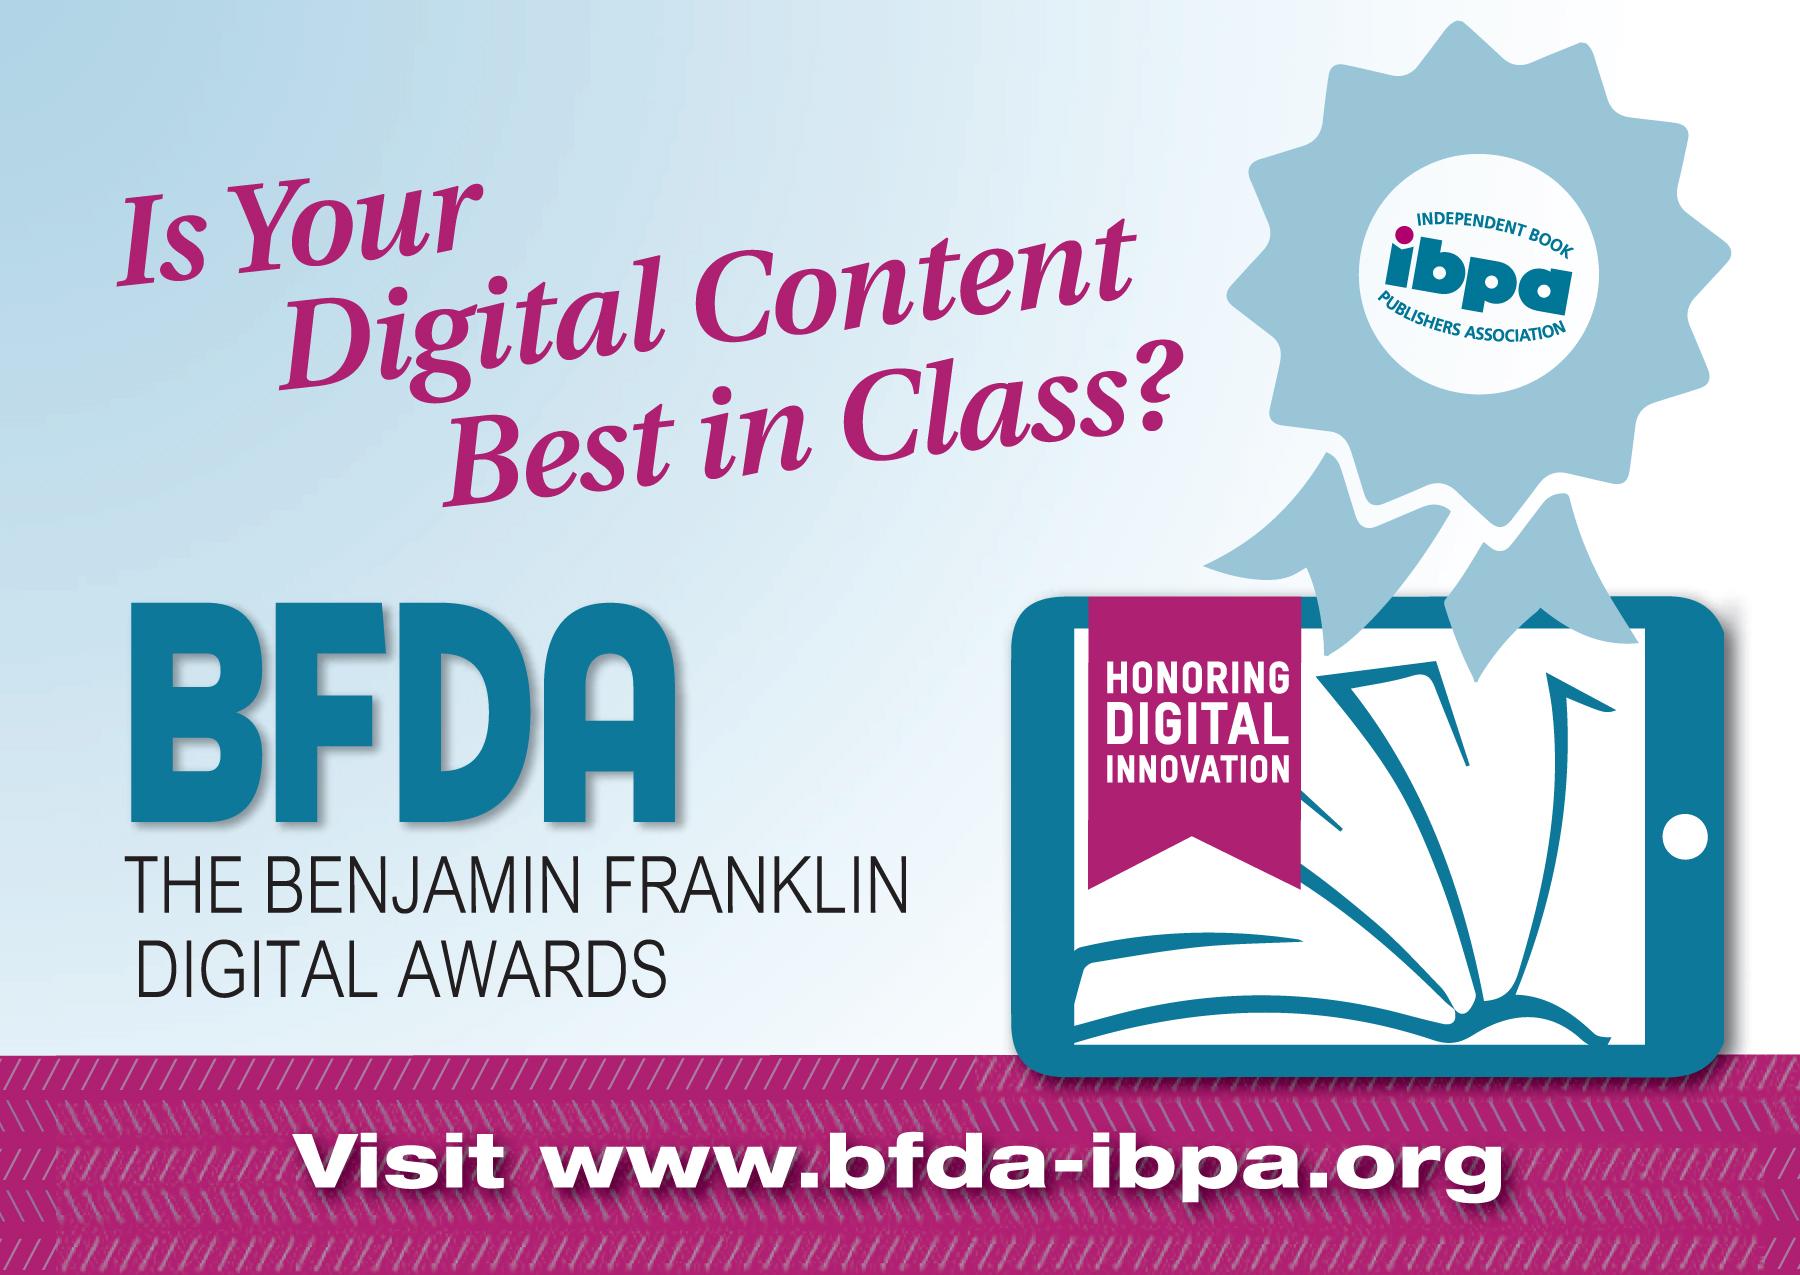 Benjamin Franklin Digital Awards